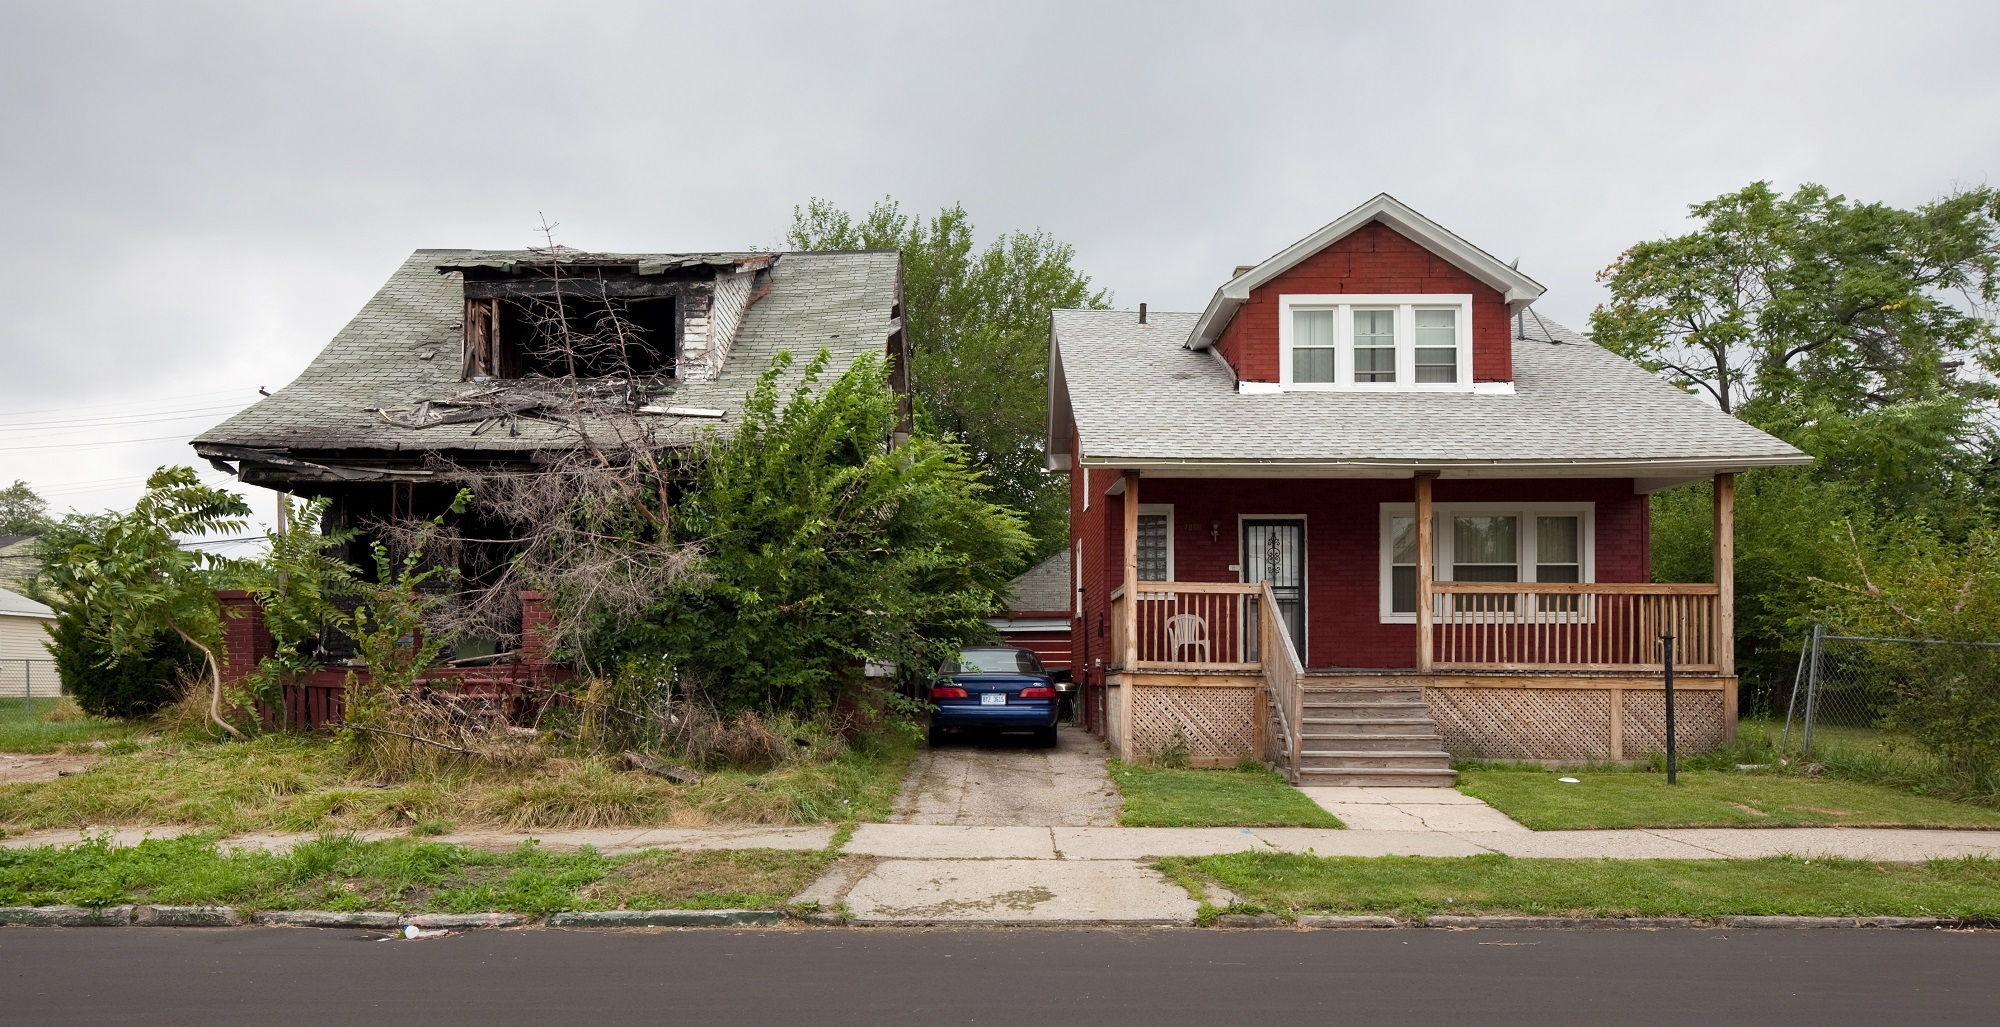 Vacant properties plague struggling US cities according